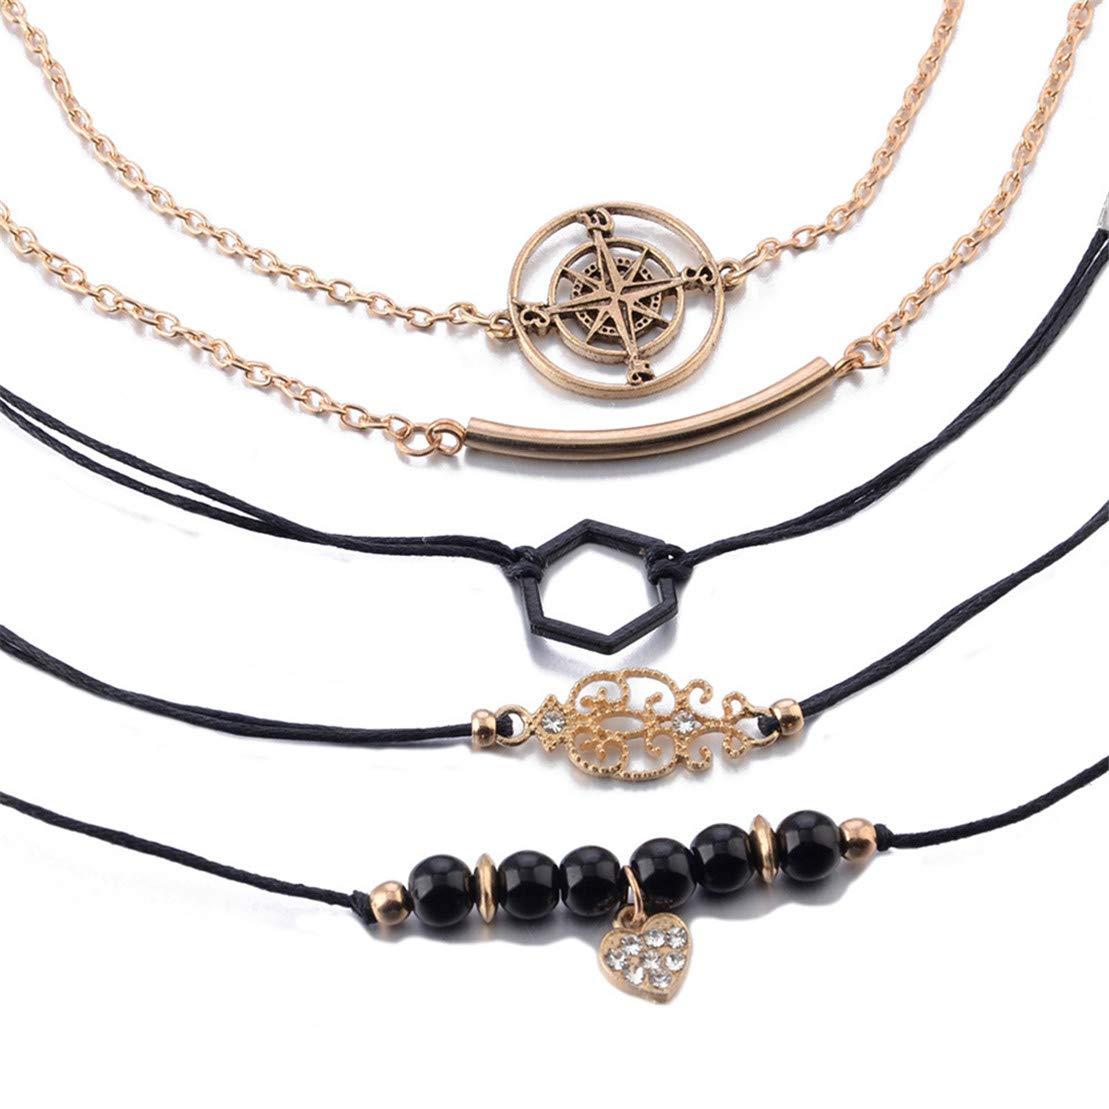 Kissherely 5 St/ück Frauen Armband Set Gold Compass Totem Anh/änger Armband Schwarz Hexagon Perlen Armband